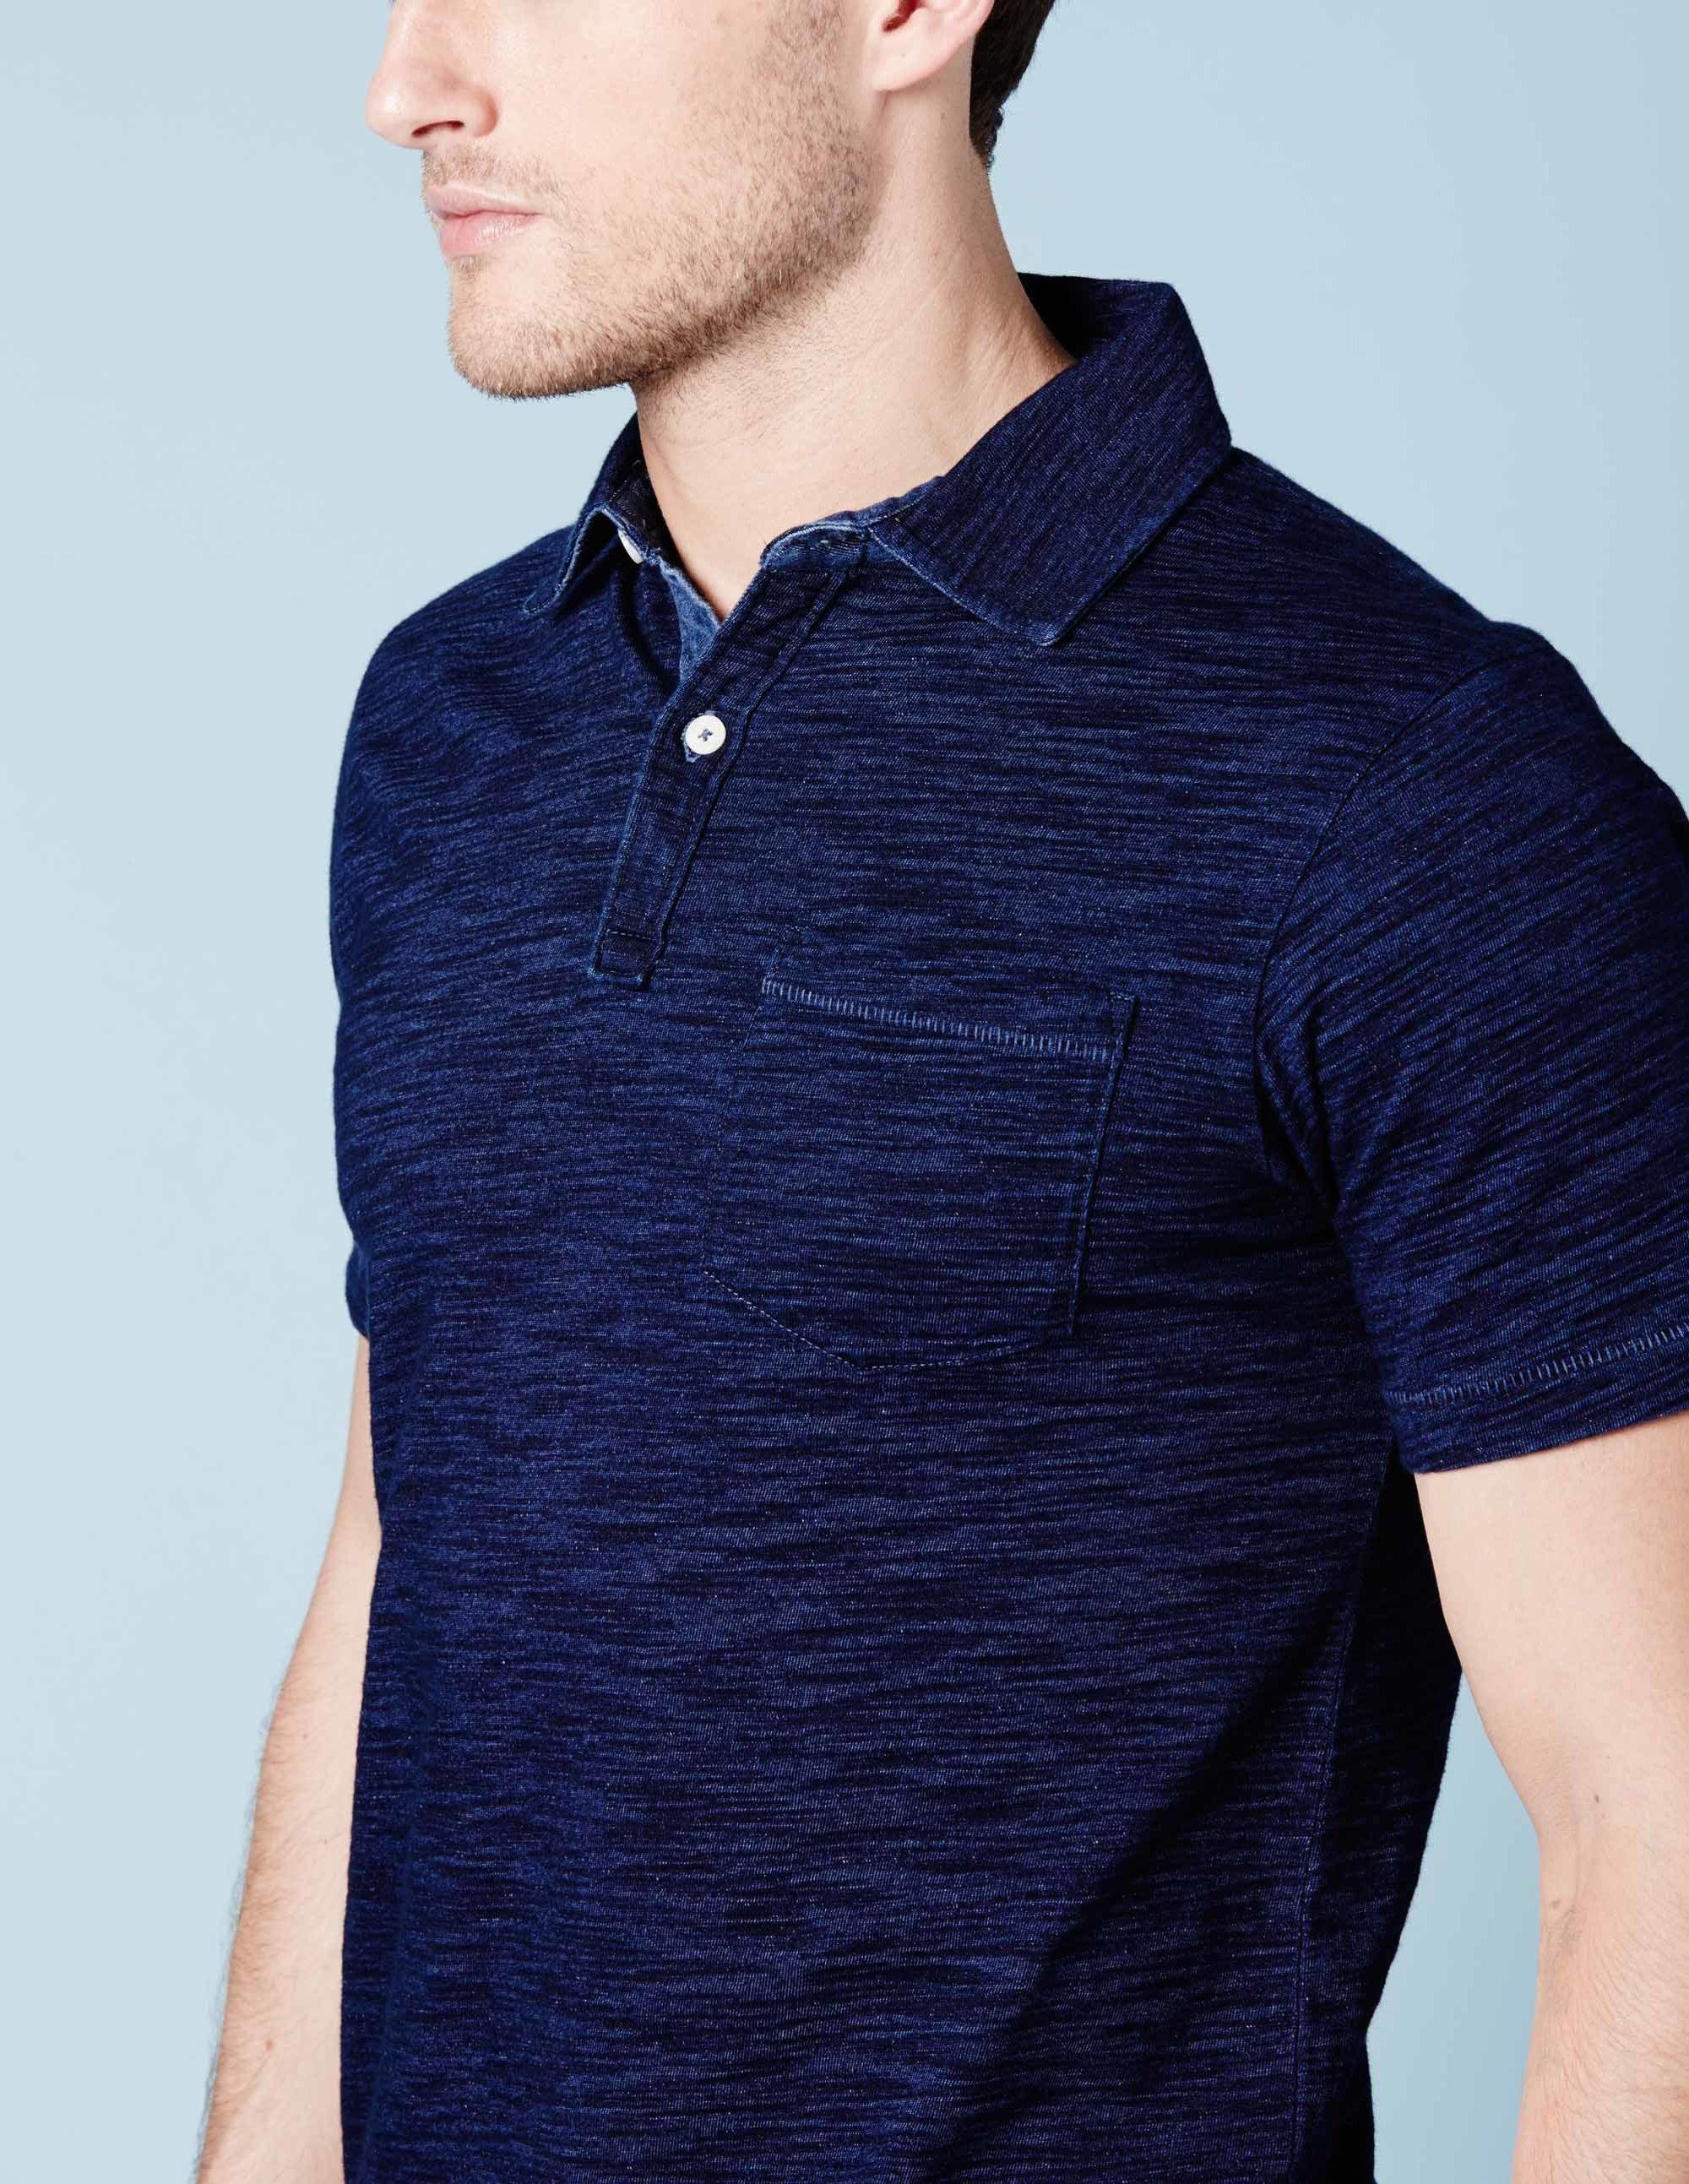 ff0687ca Indigo Slub Polo Polo Shirt Outfits, Polo Shirt Style, Polo Outfit, Man  Outfit